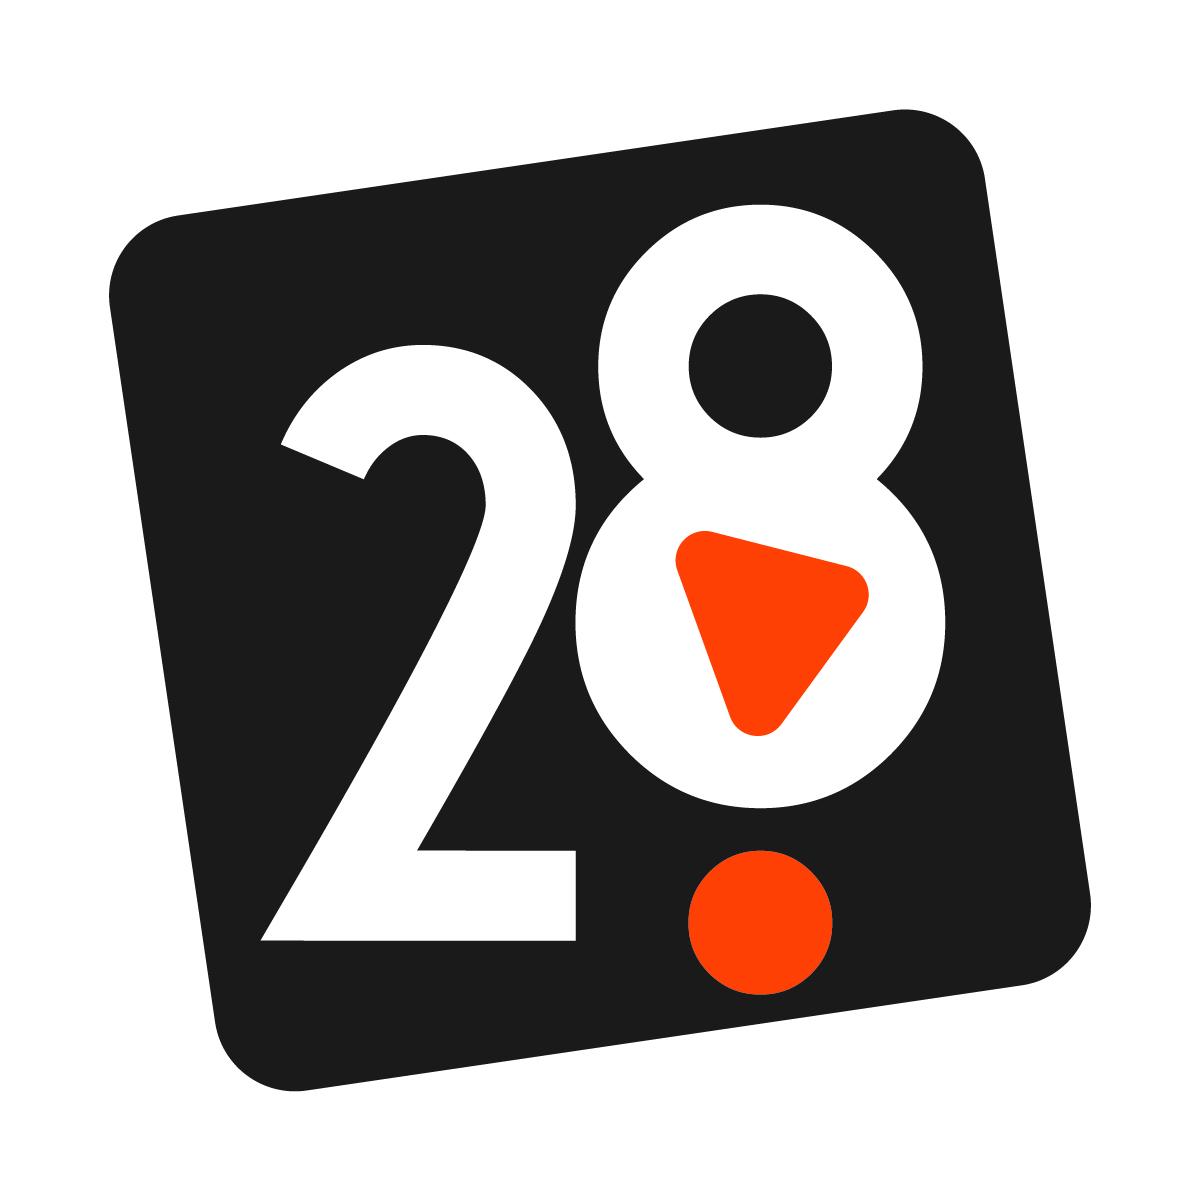 28_logo_reseaux_sociaux.jpg